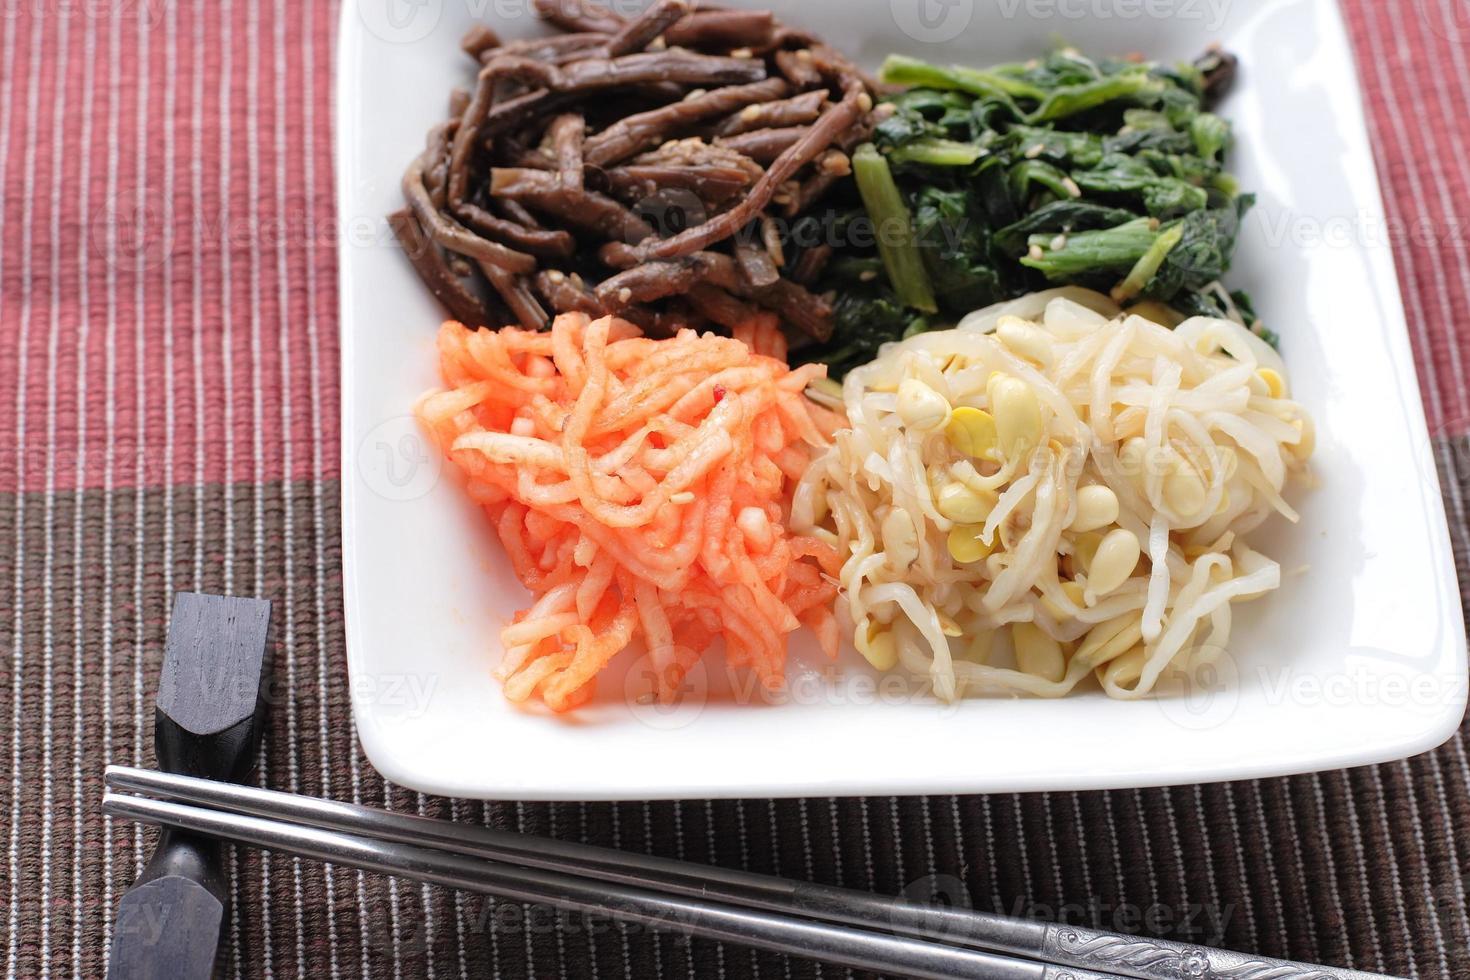 koreansk mat, namul kimchi foto